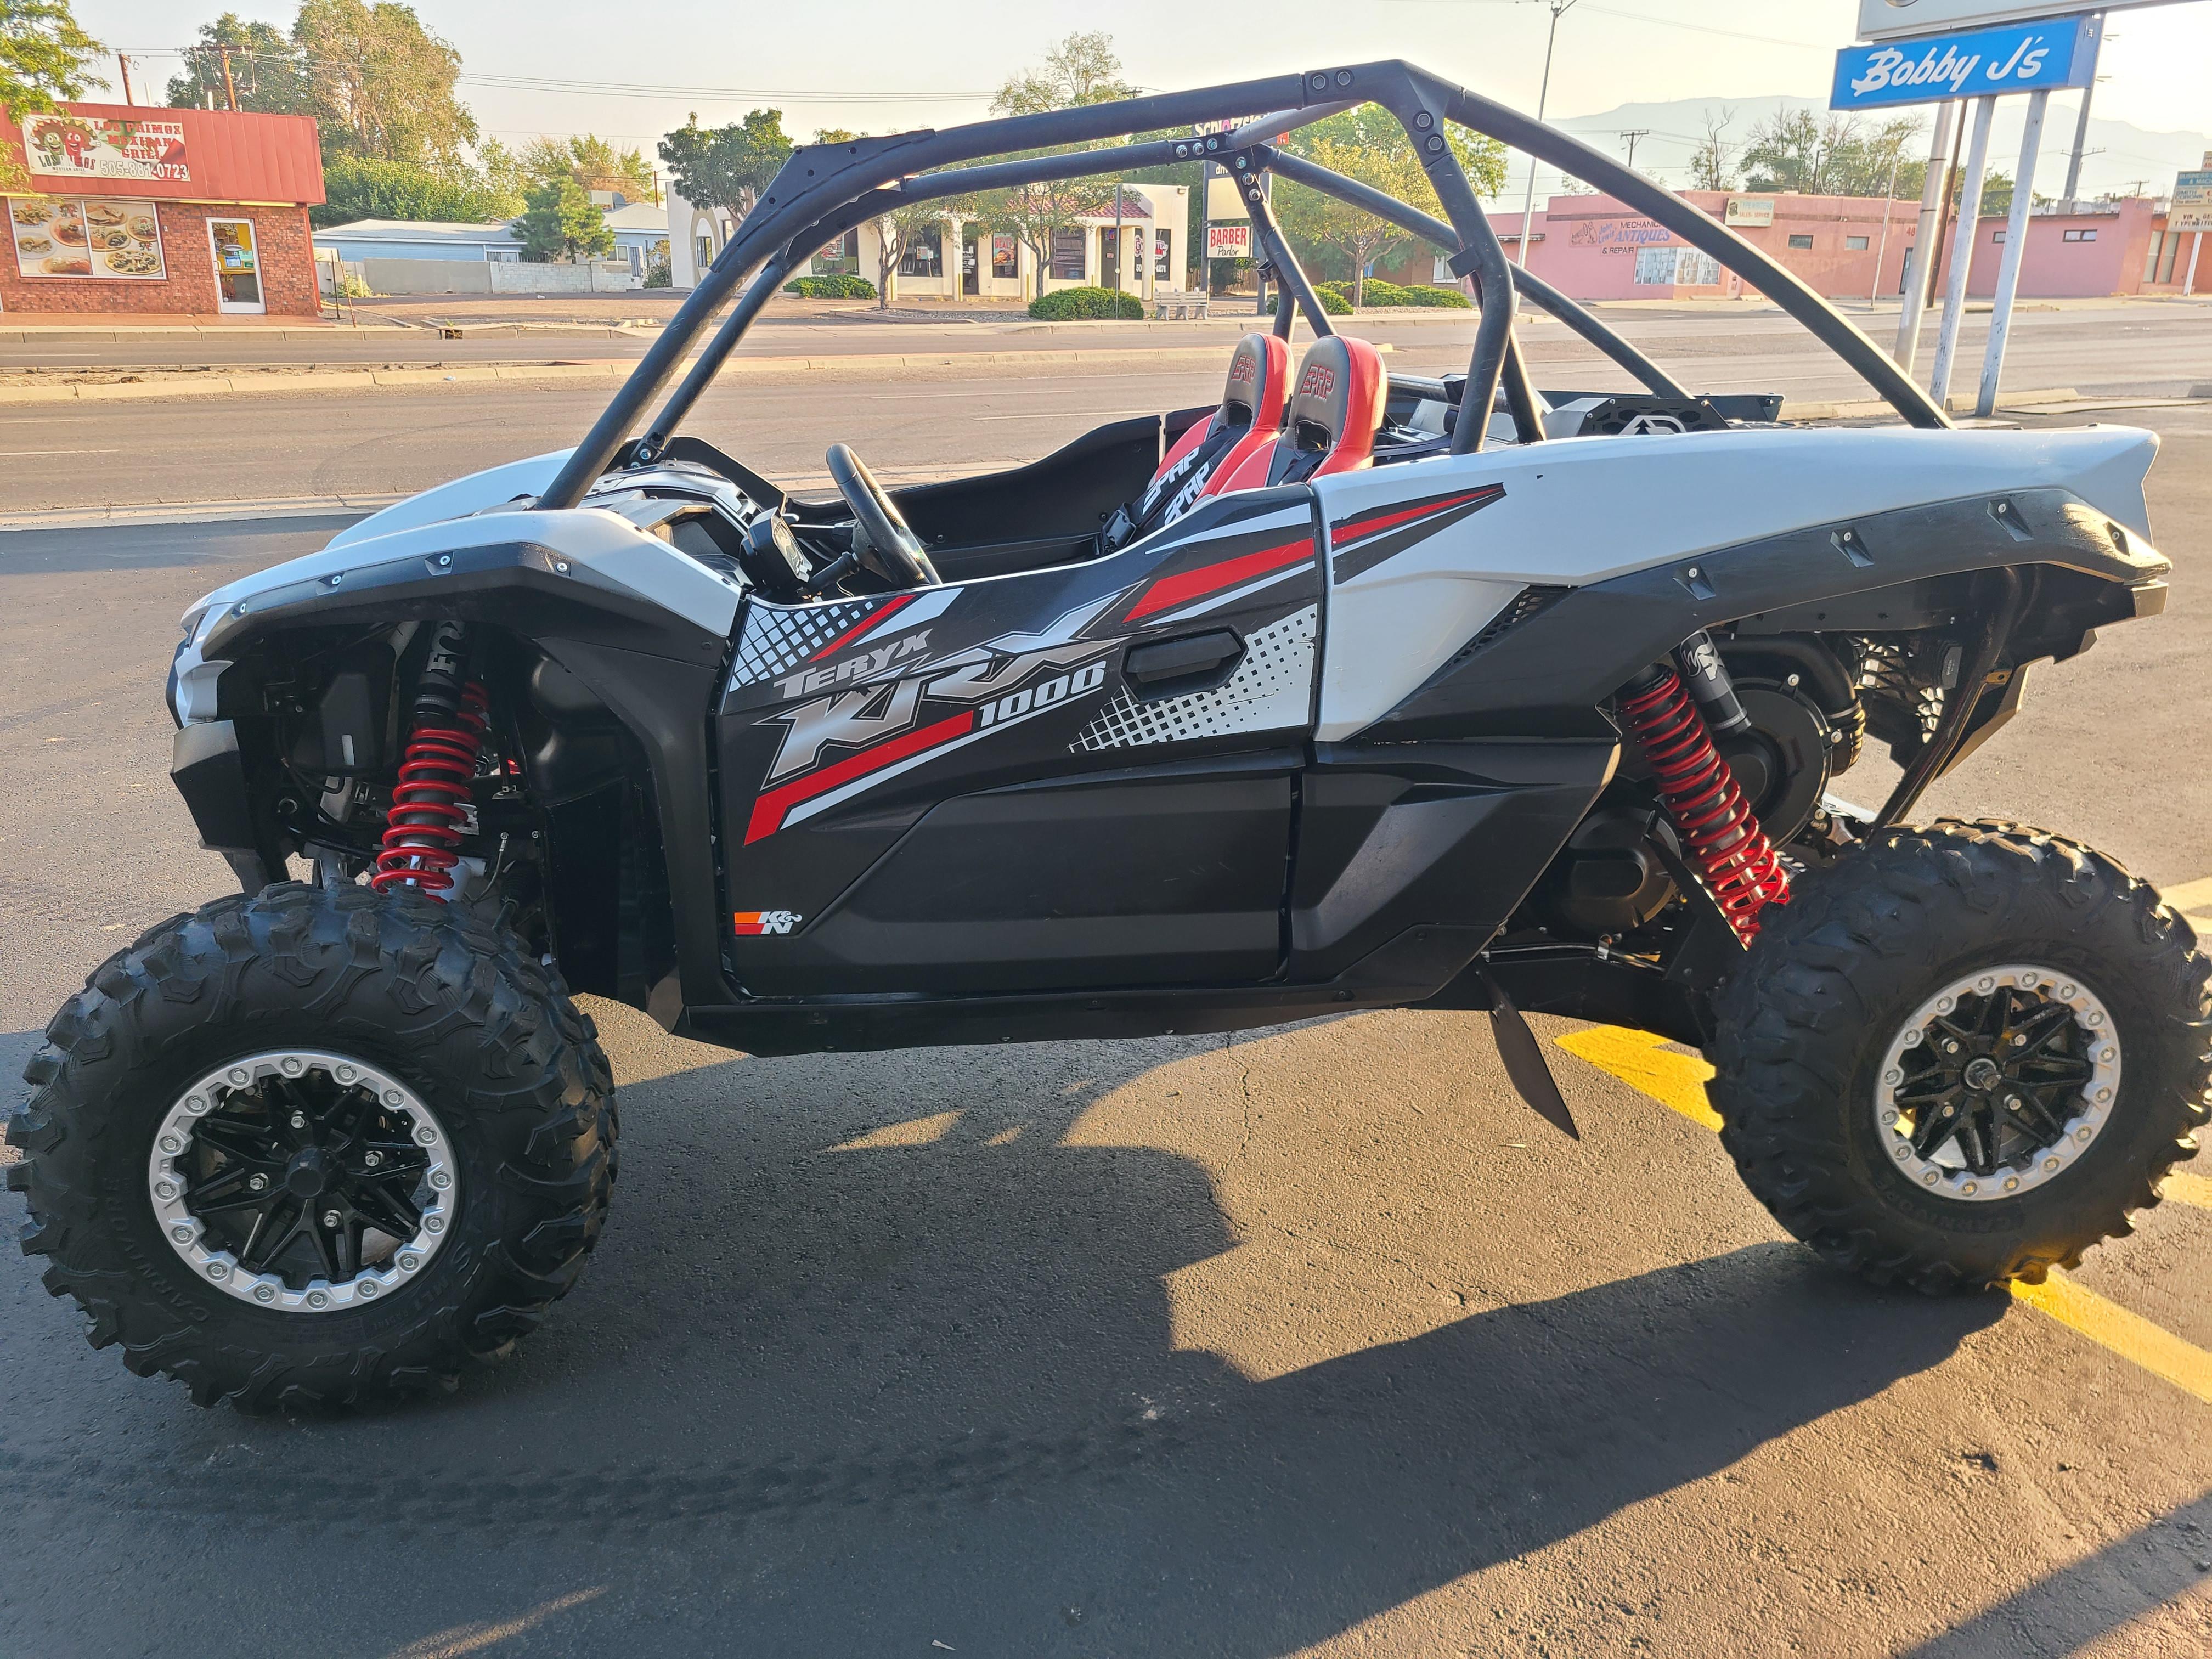 2020 Kawasaki Teryx KRX 1000 at Bobby J's Yamaha, Albuquerque, NM 87110